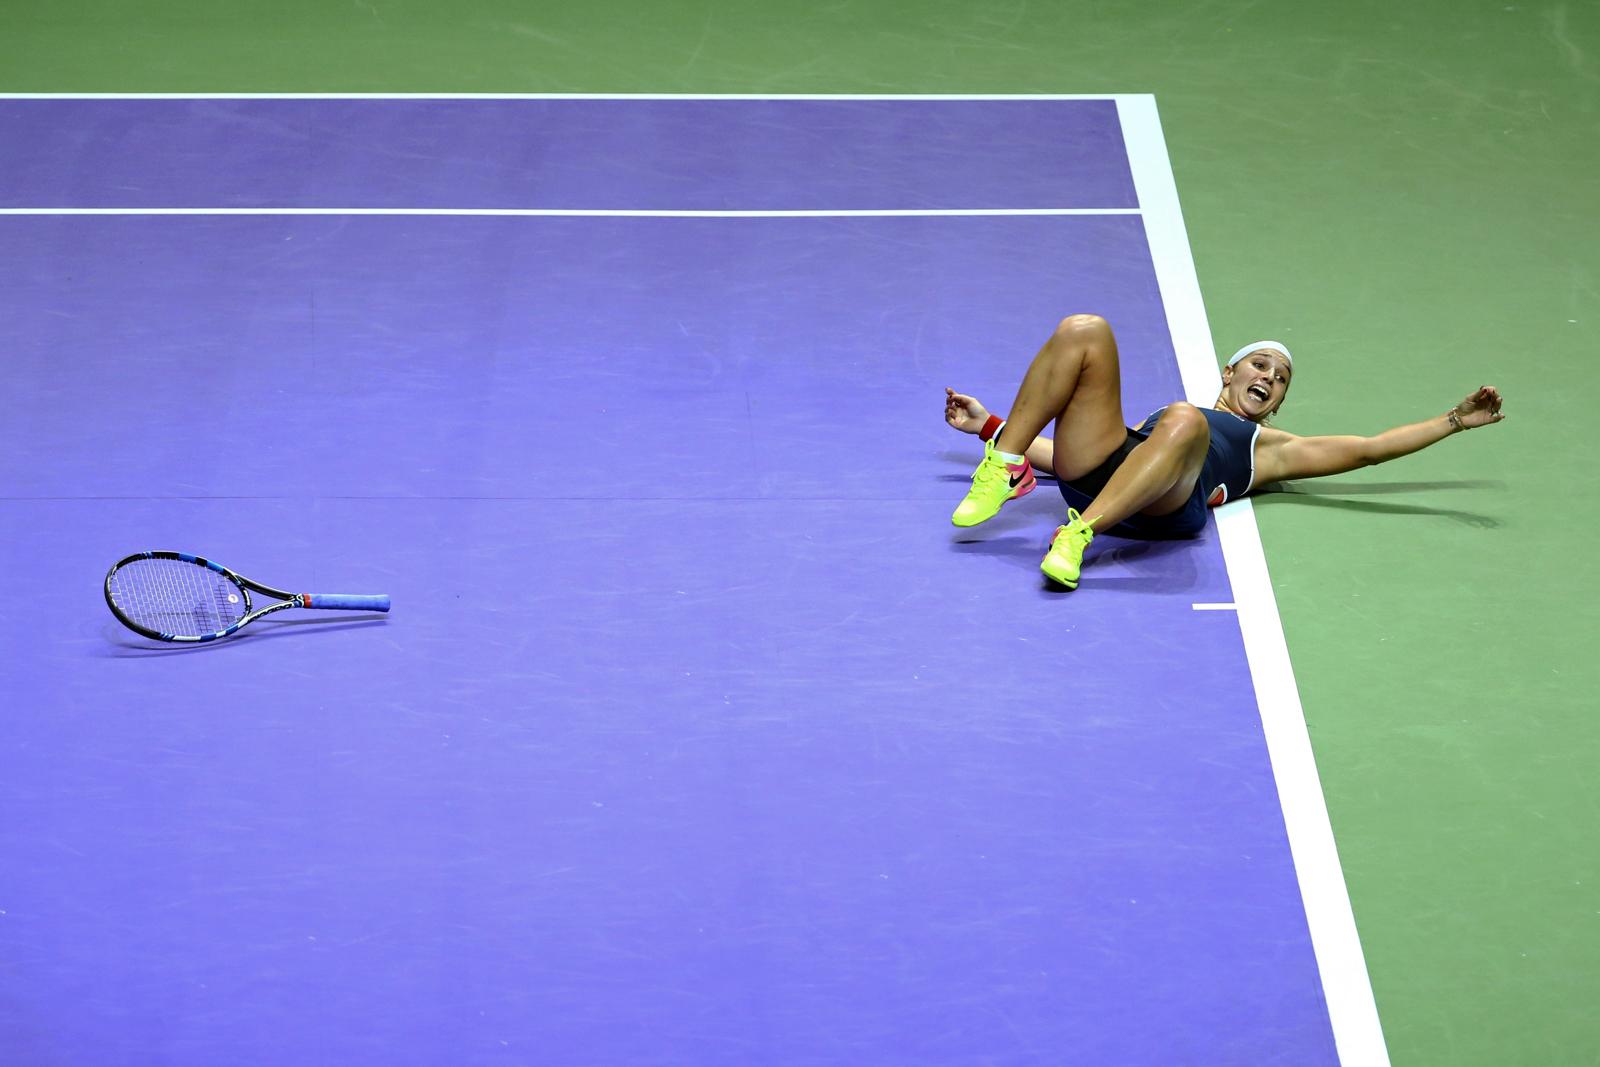 Tennis - BNP Paribas WTA Finals - Singapore Indoor Stadium - 30/10/16 Slovakia's Dominika Cibulkova celebrates during her final match Mandatory Credit: Action Images / Yong Teck Lim Livepic EDITORIAL USE ONLY.